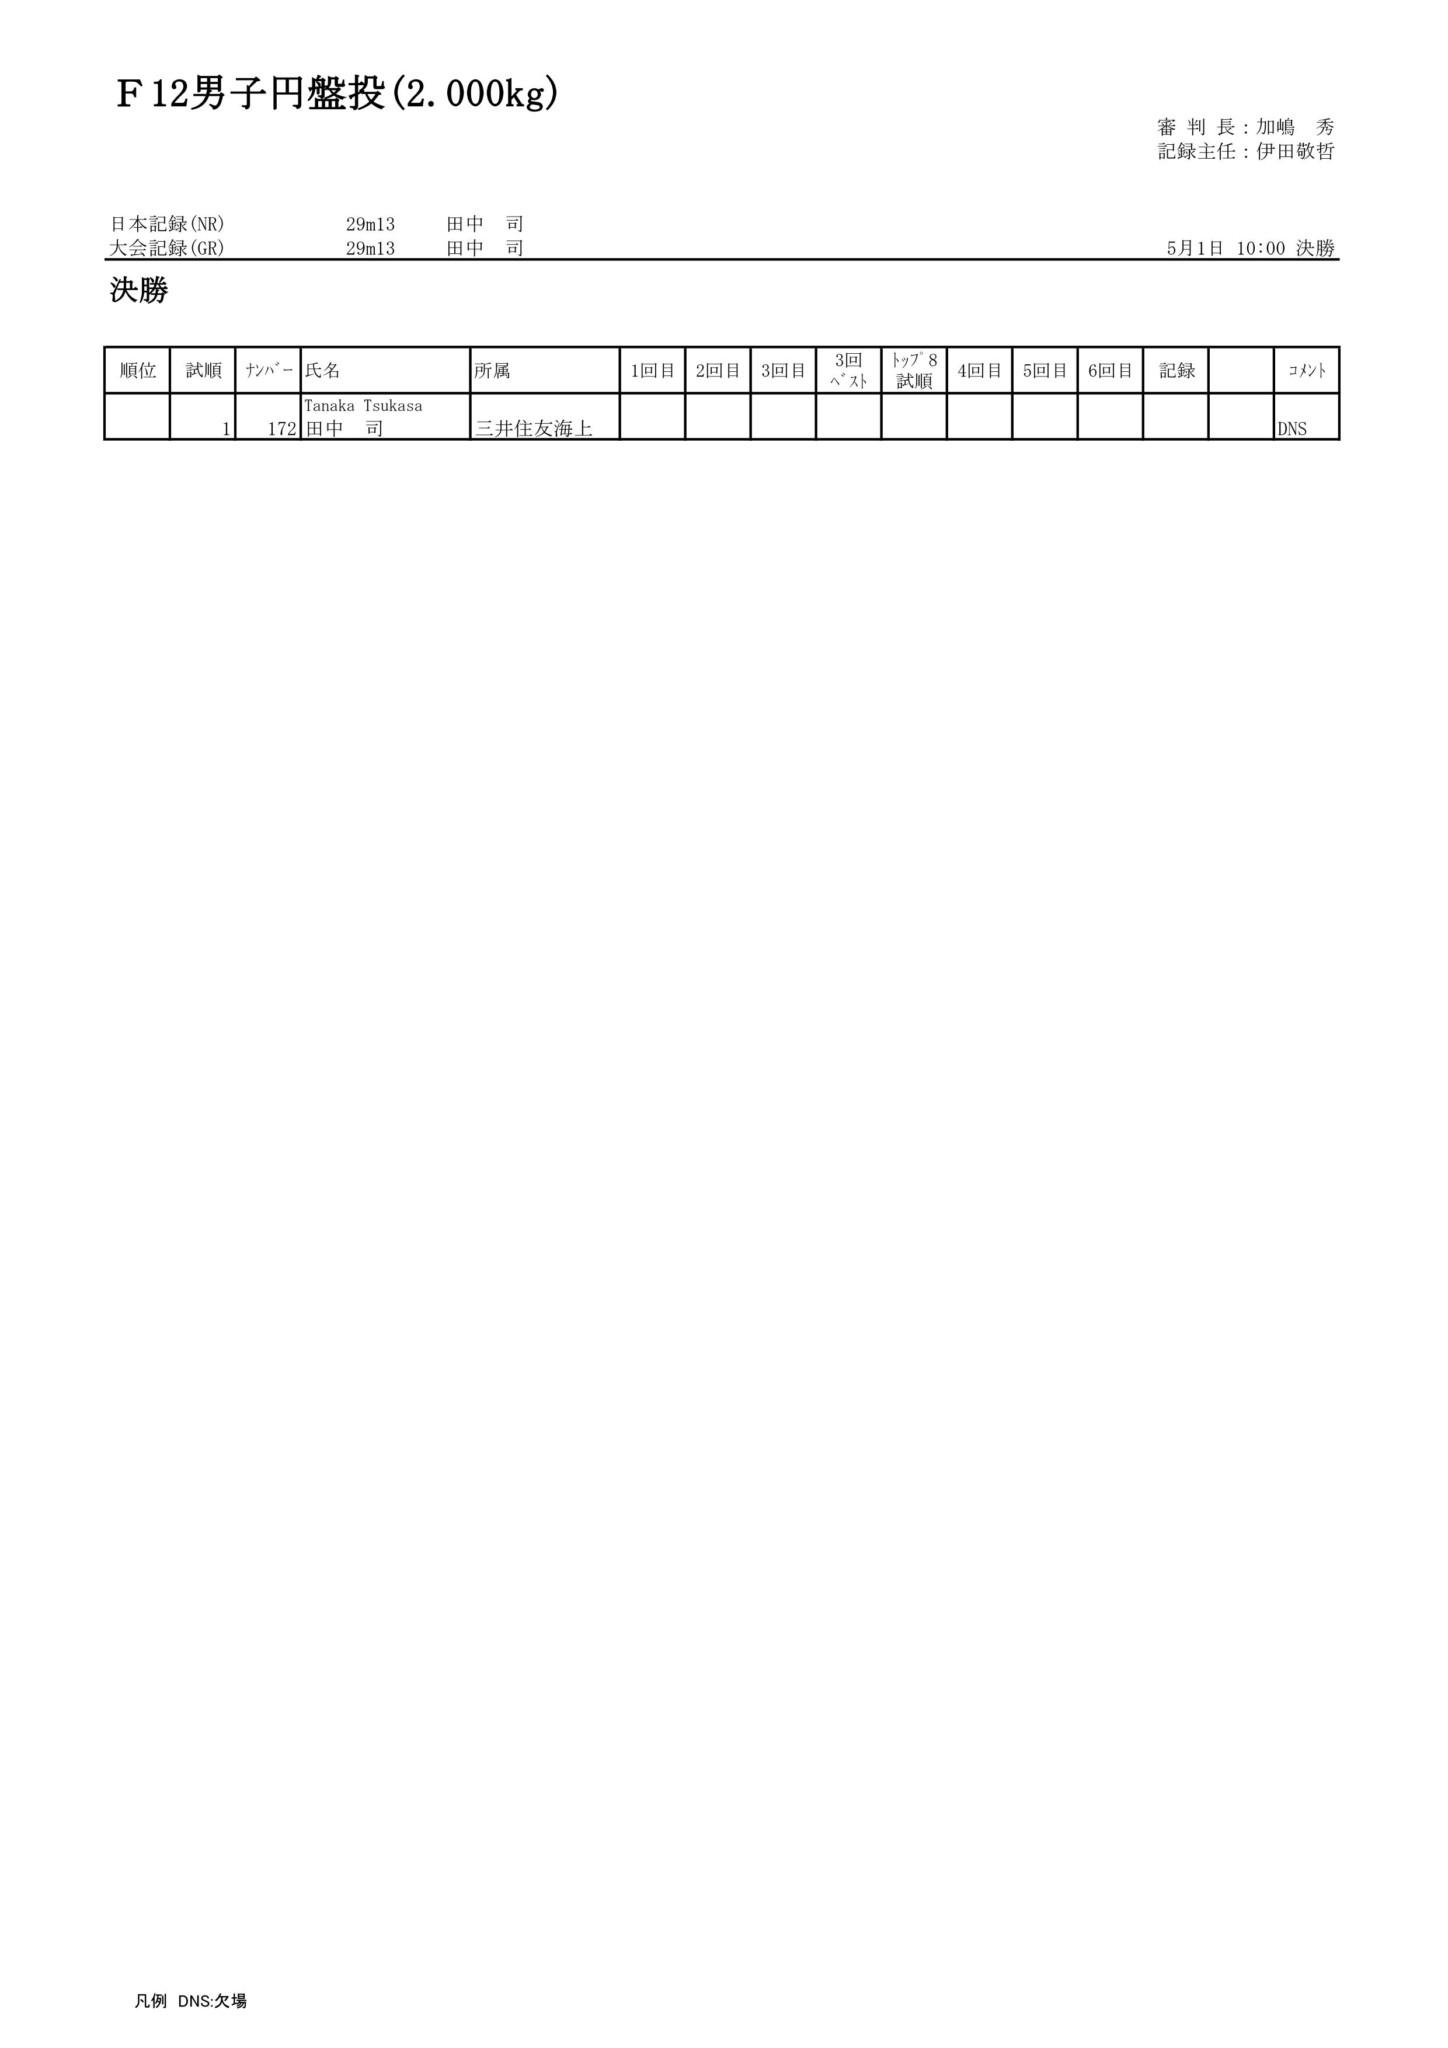 09F12男子円盤投(2.000kg)_01